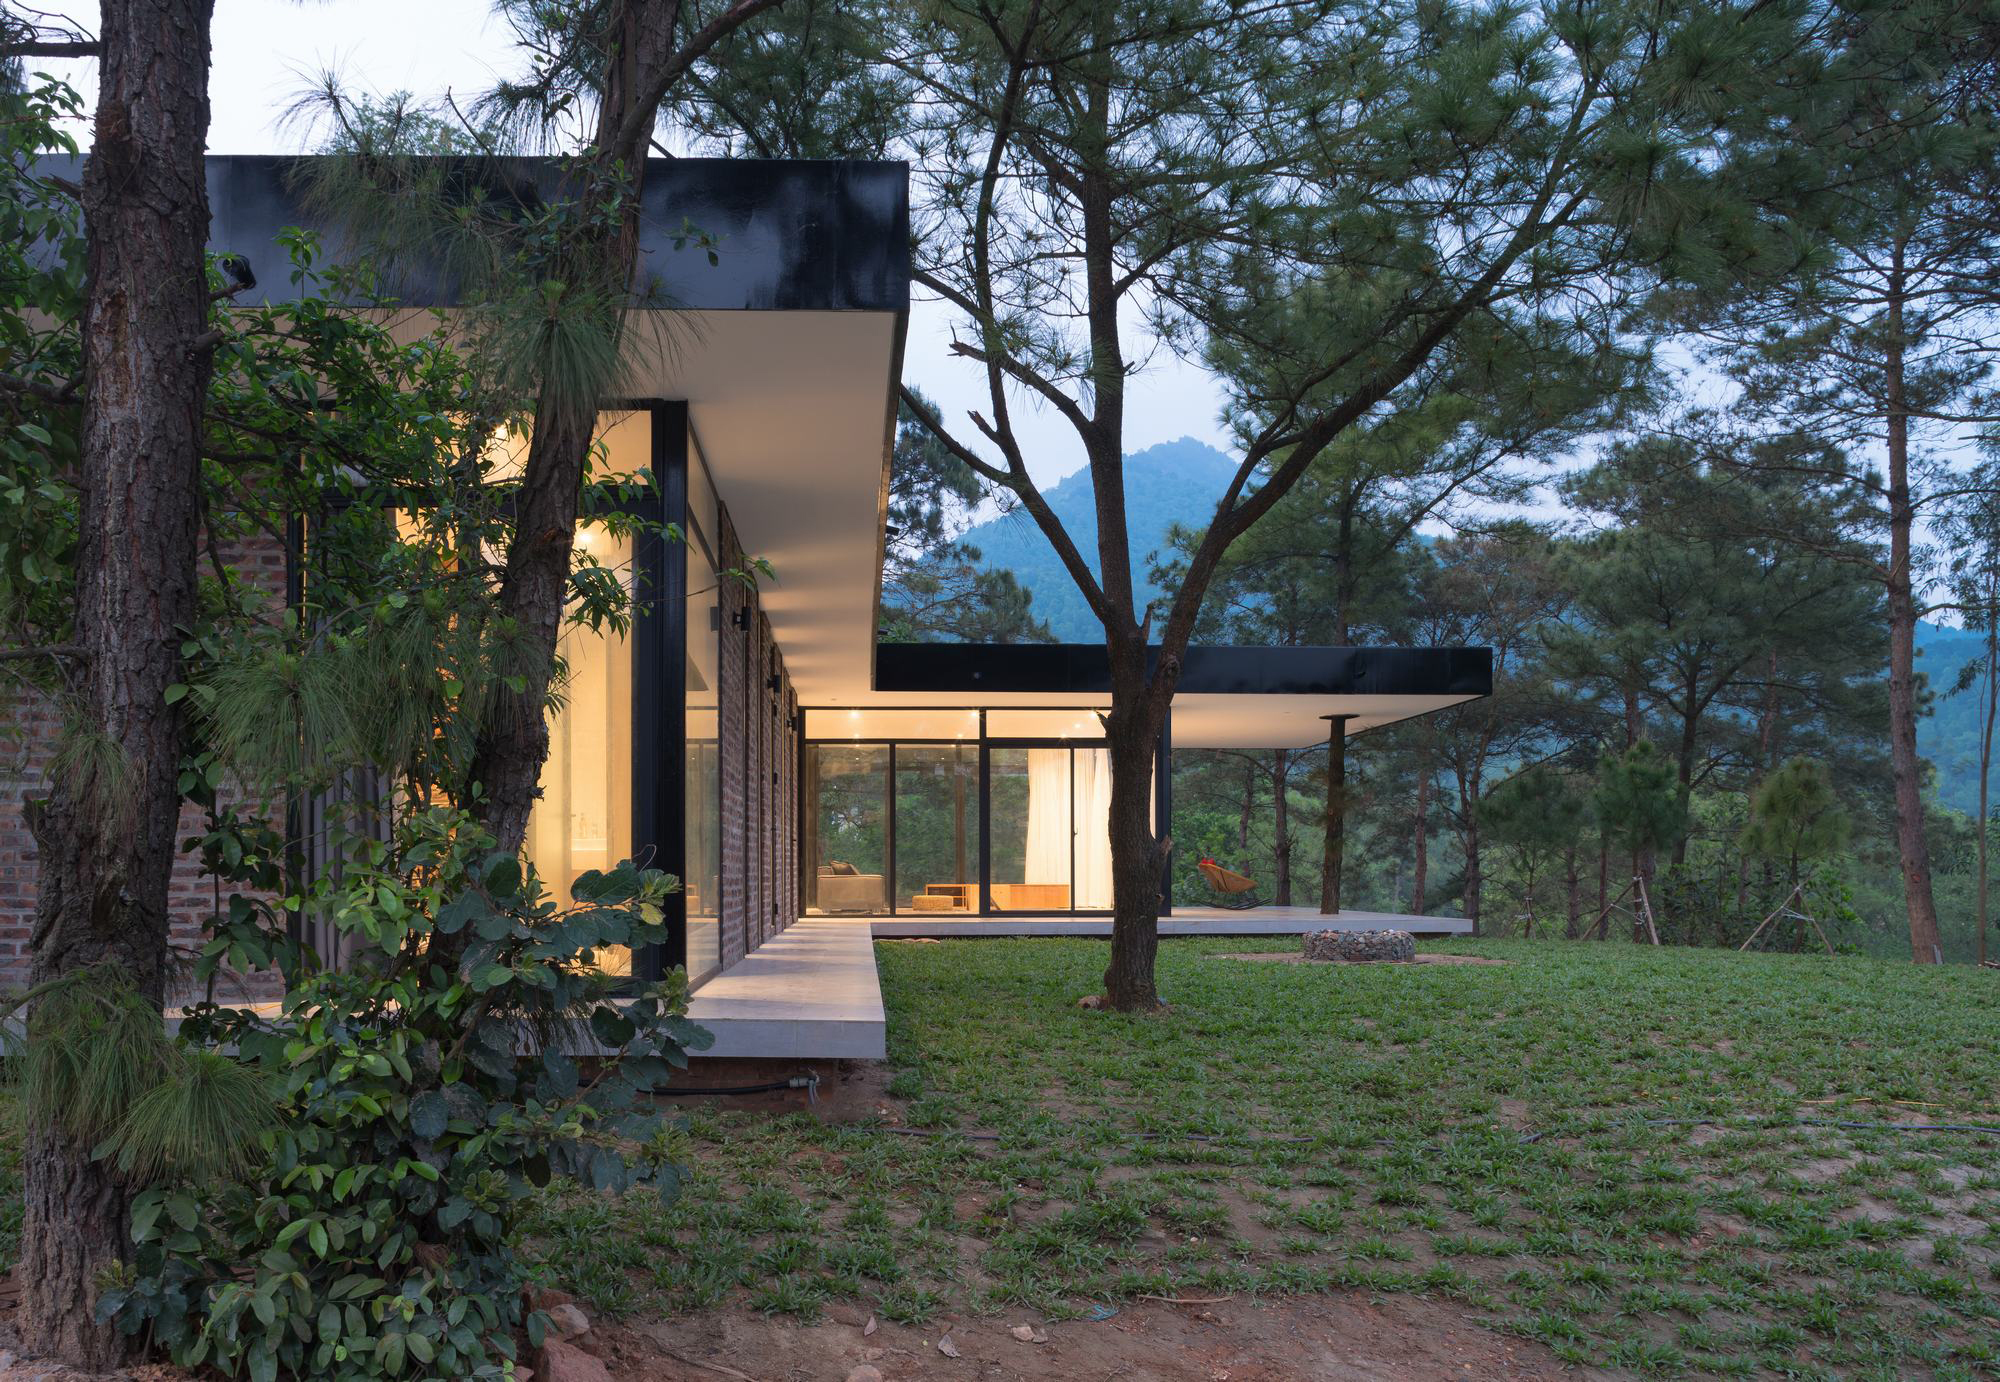 Casa bajo los pinos / Idee architects